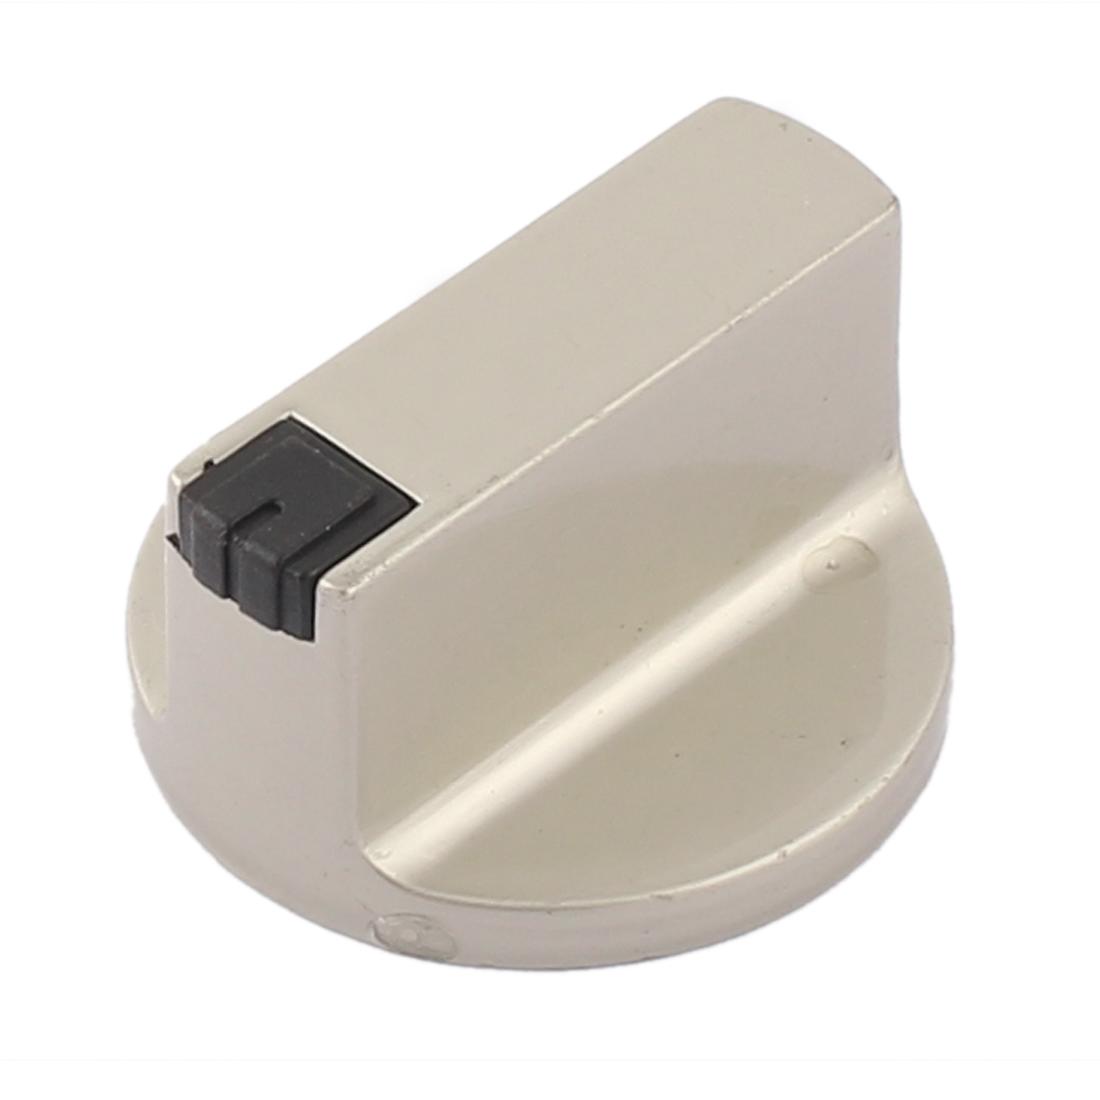 Kitchen Gas Stove Oven Alloy Rotary Controller Switch Range Knob Gray 4cm Dia